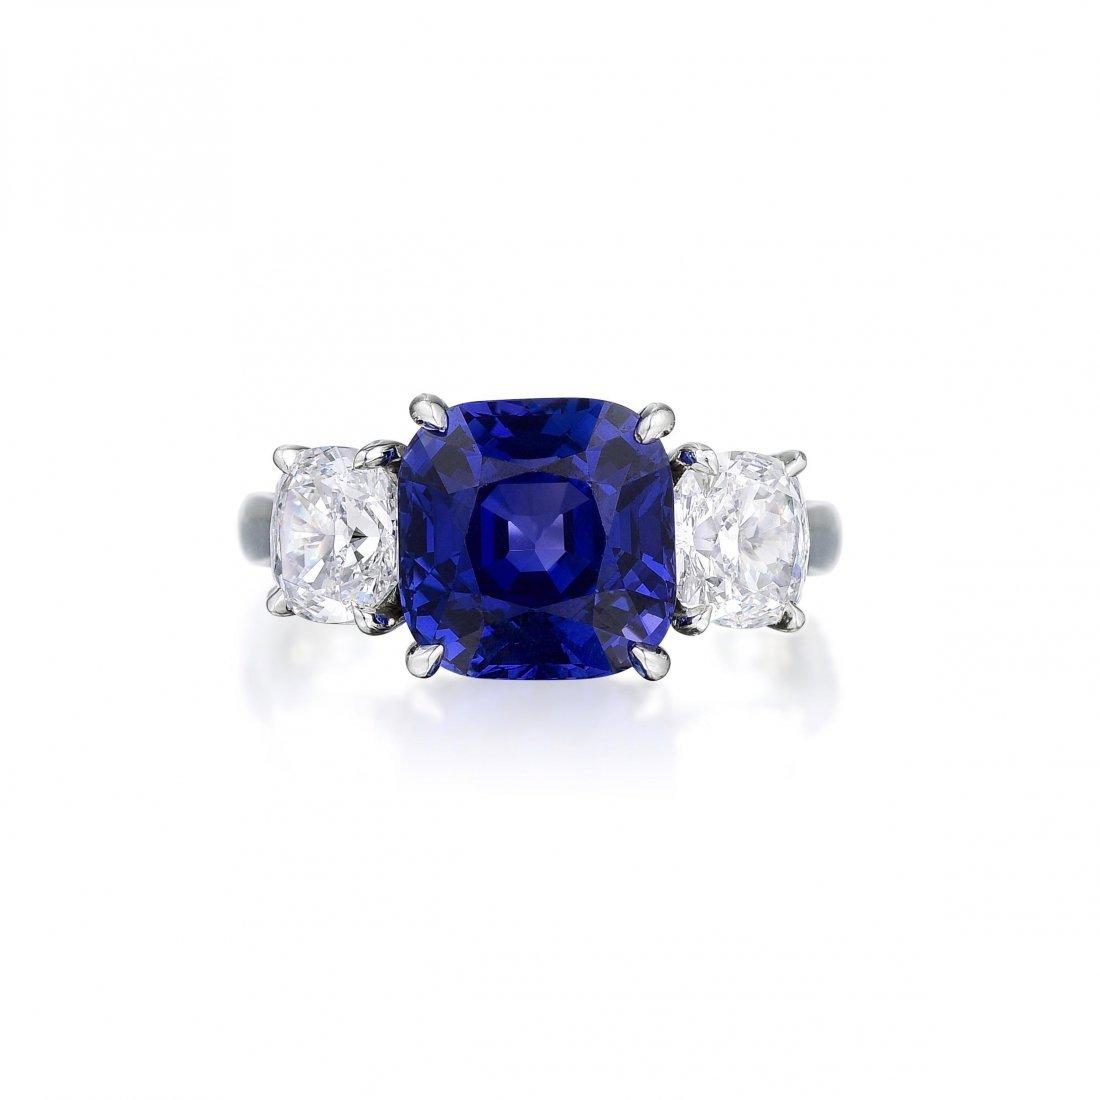 Cartier 6.69-Carat Burmese Sapphire and Diamond Ring - 2